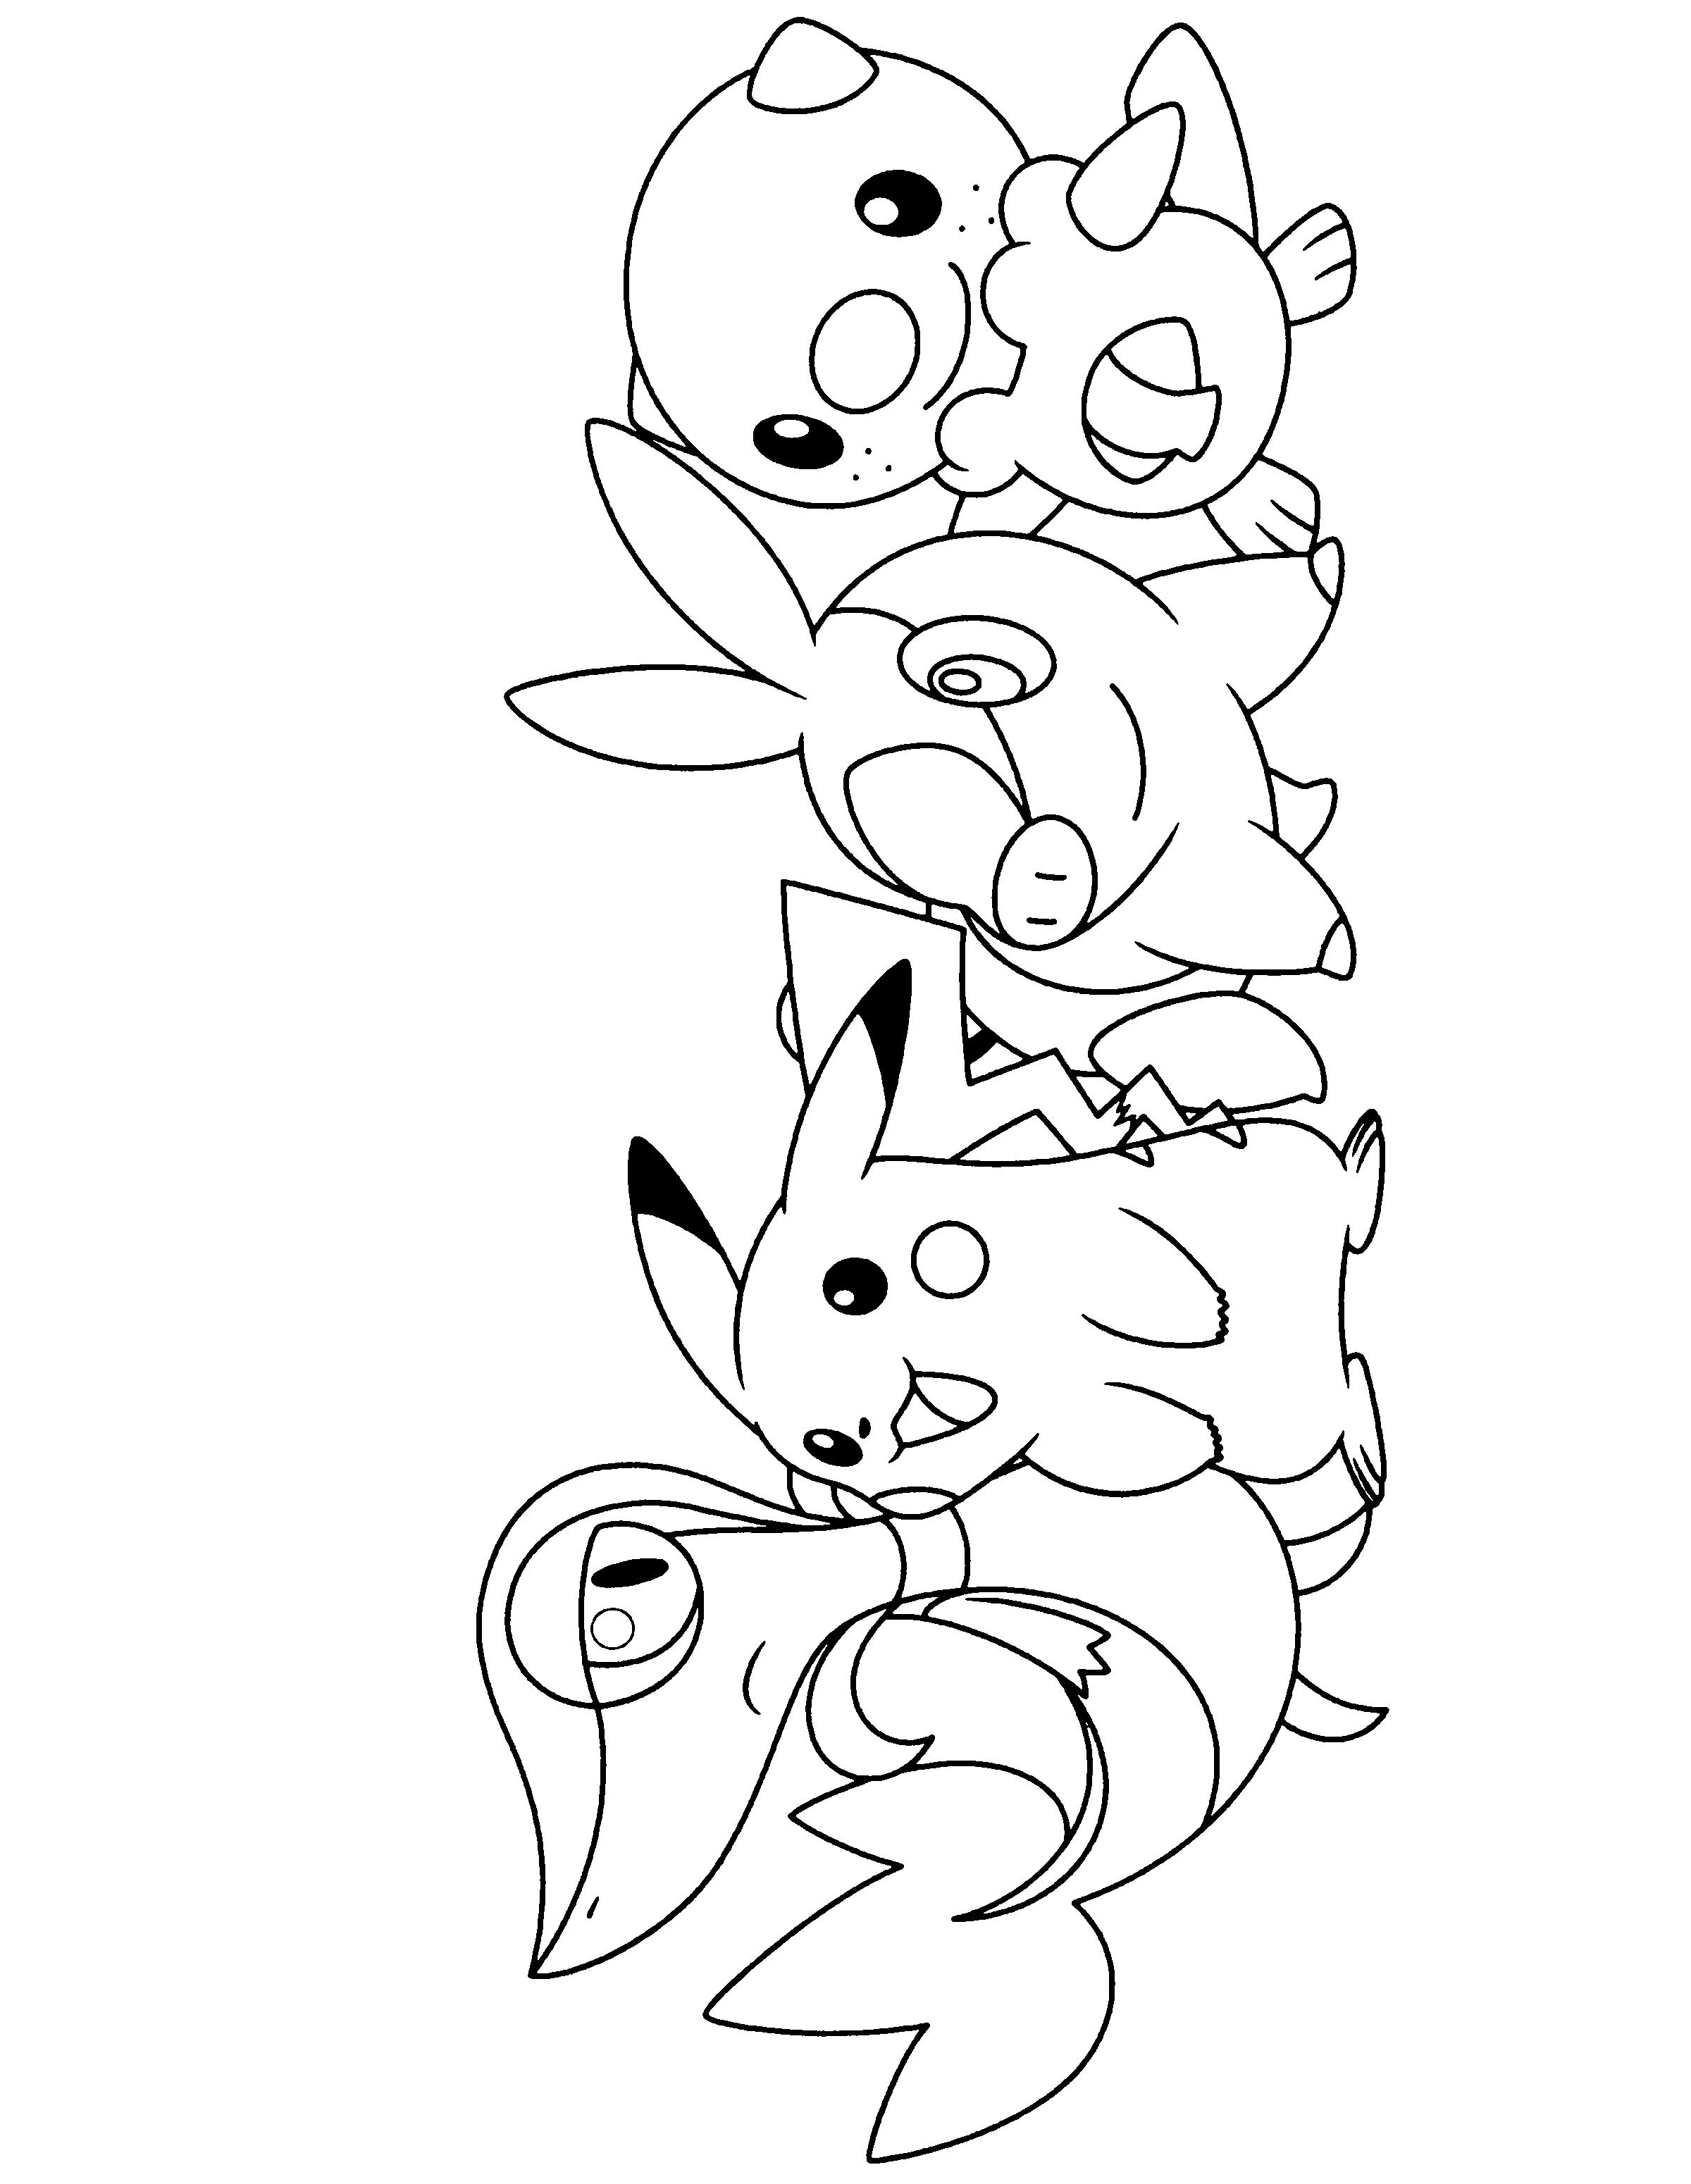 Drawn pikachu black and white White black pokemon Google pages